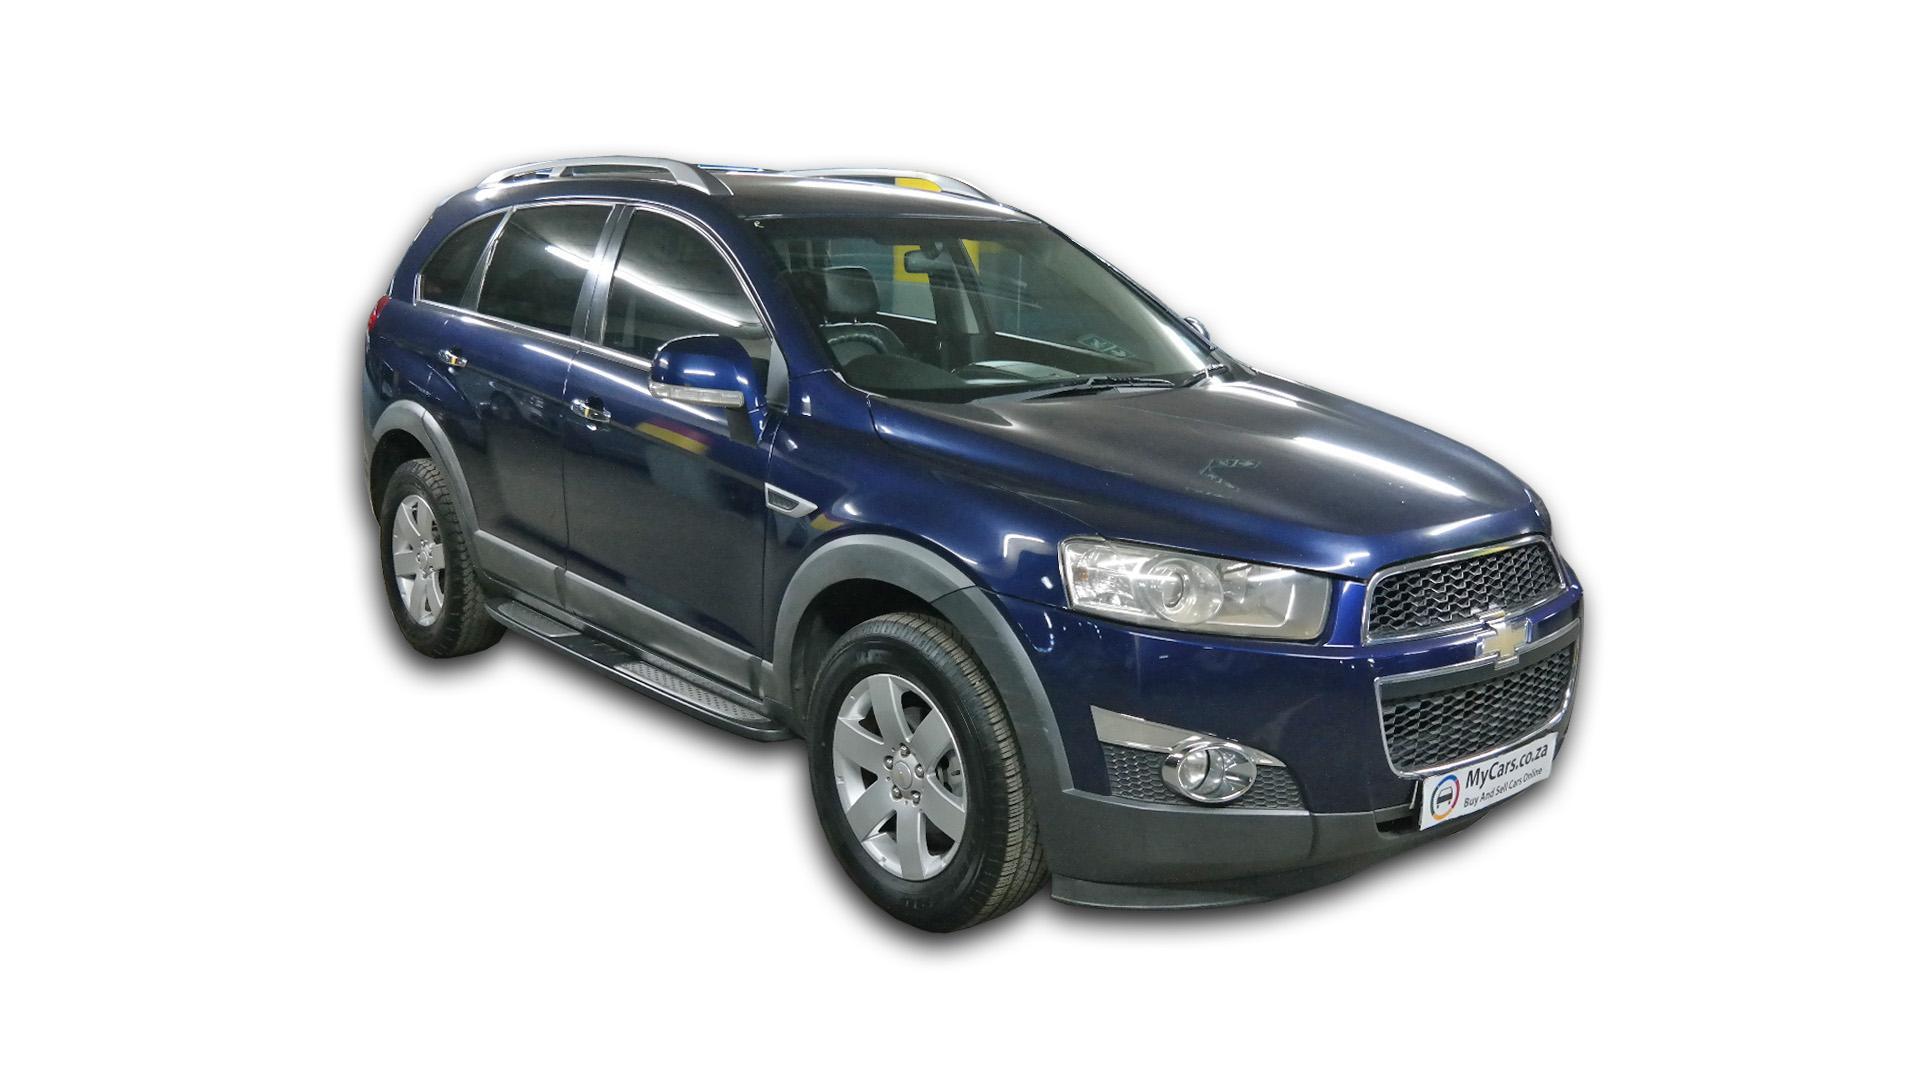 Chevrolet Captiva 2.4 LT